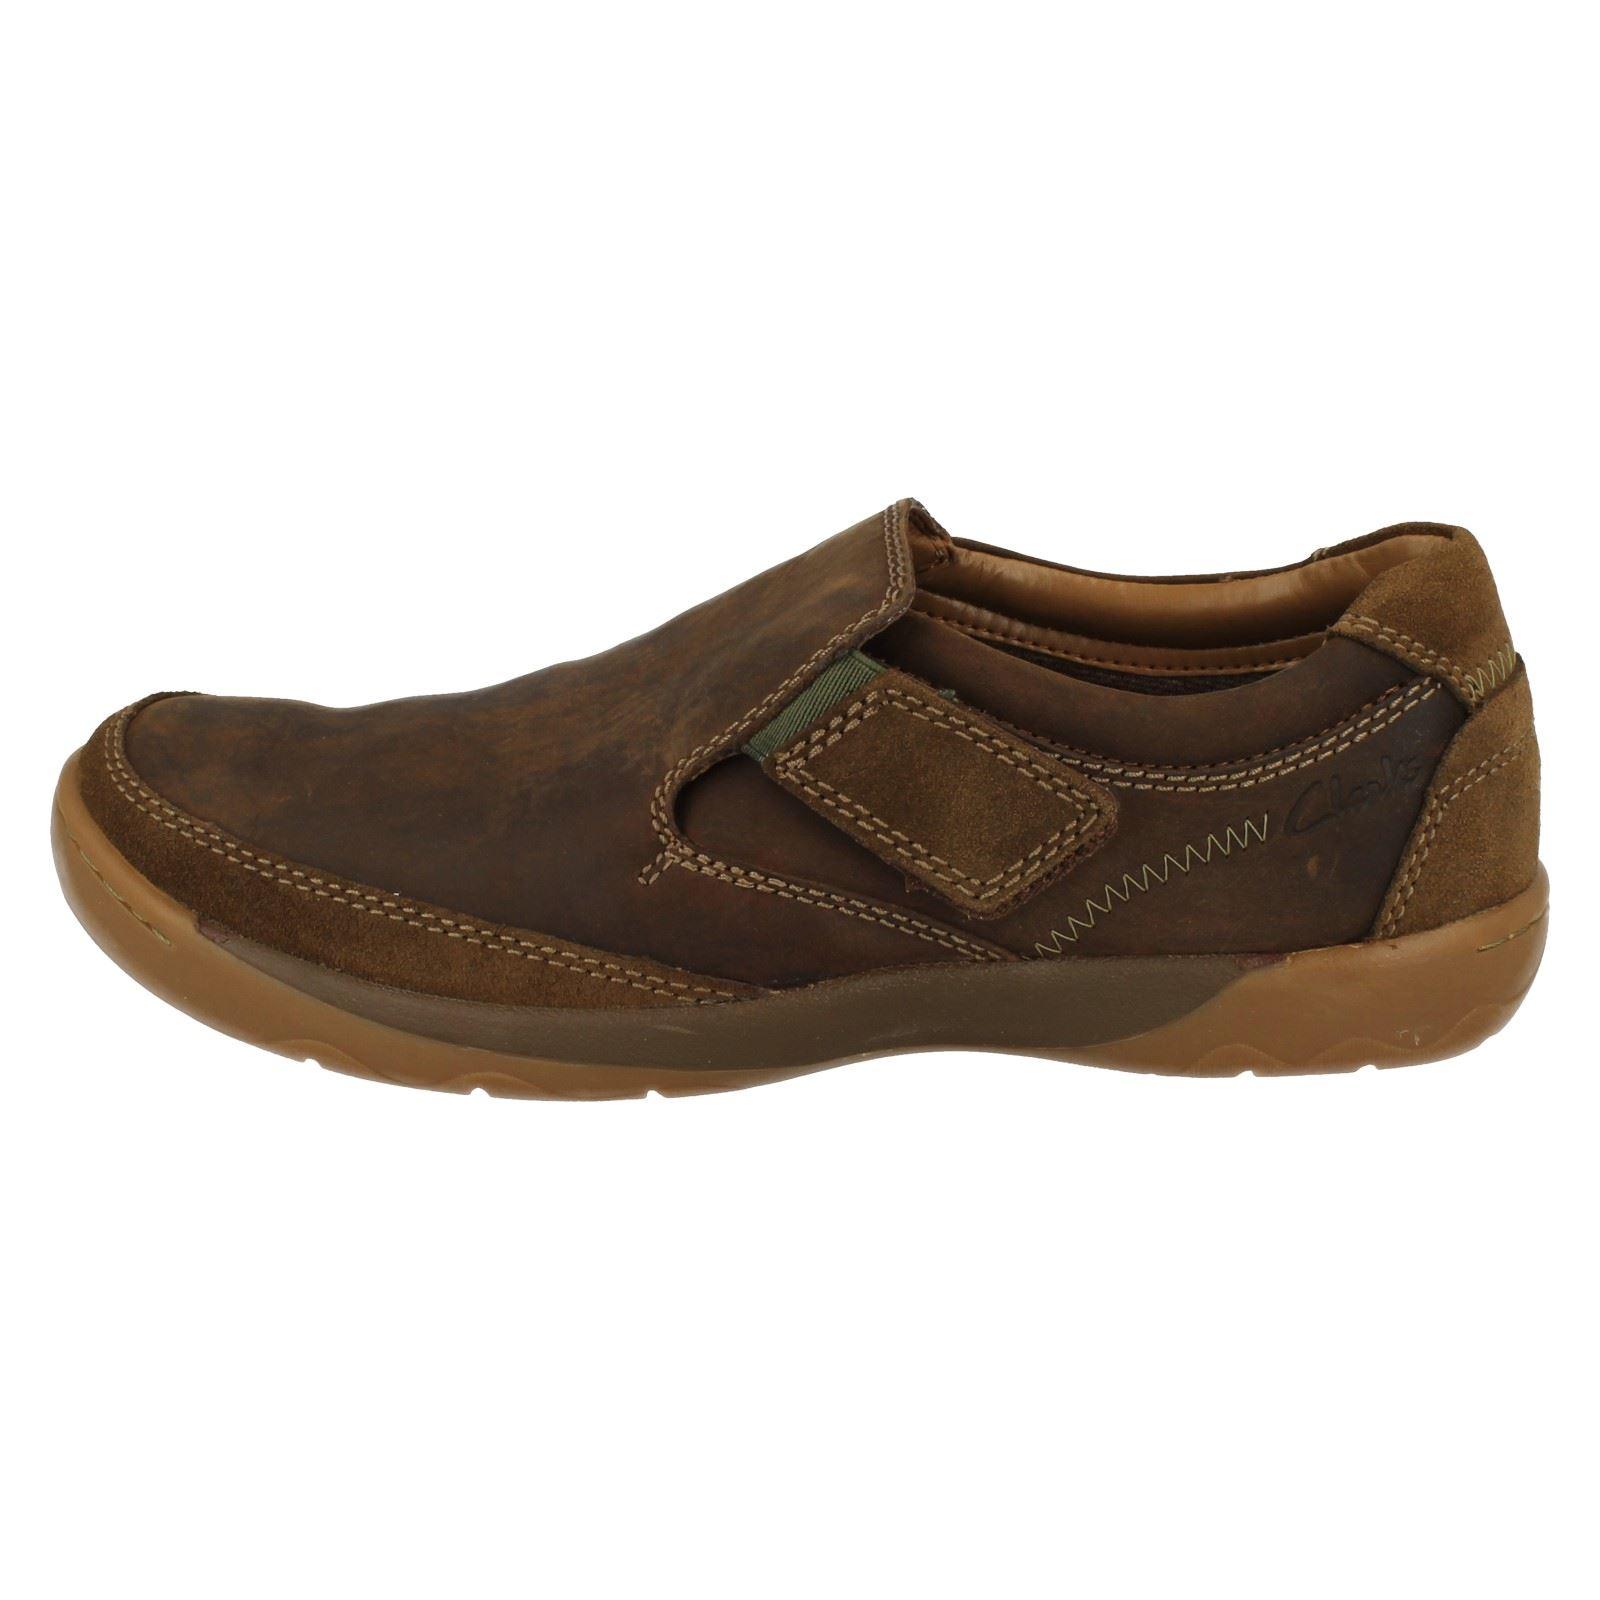 Step Clarks Mens marrone tabacco casual Ridgeway Scarpe 1E1dqTw